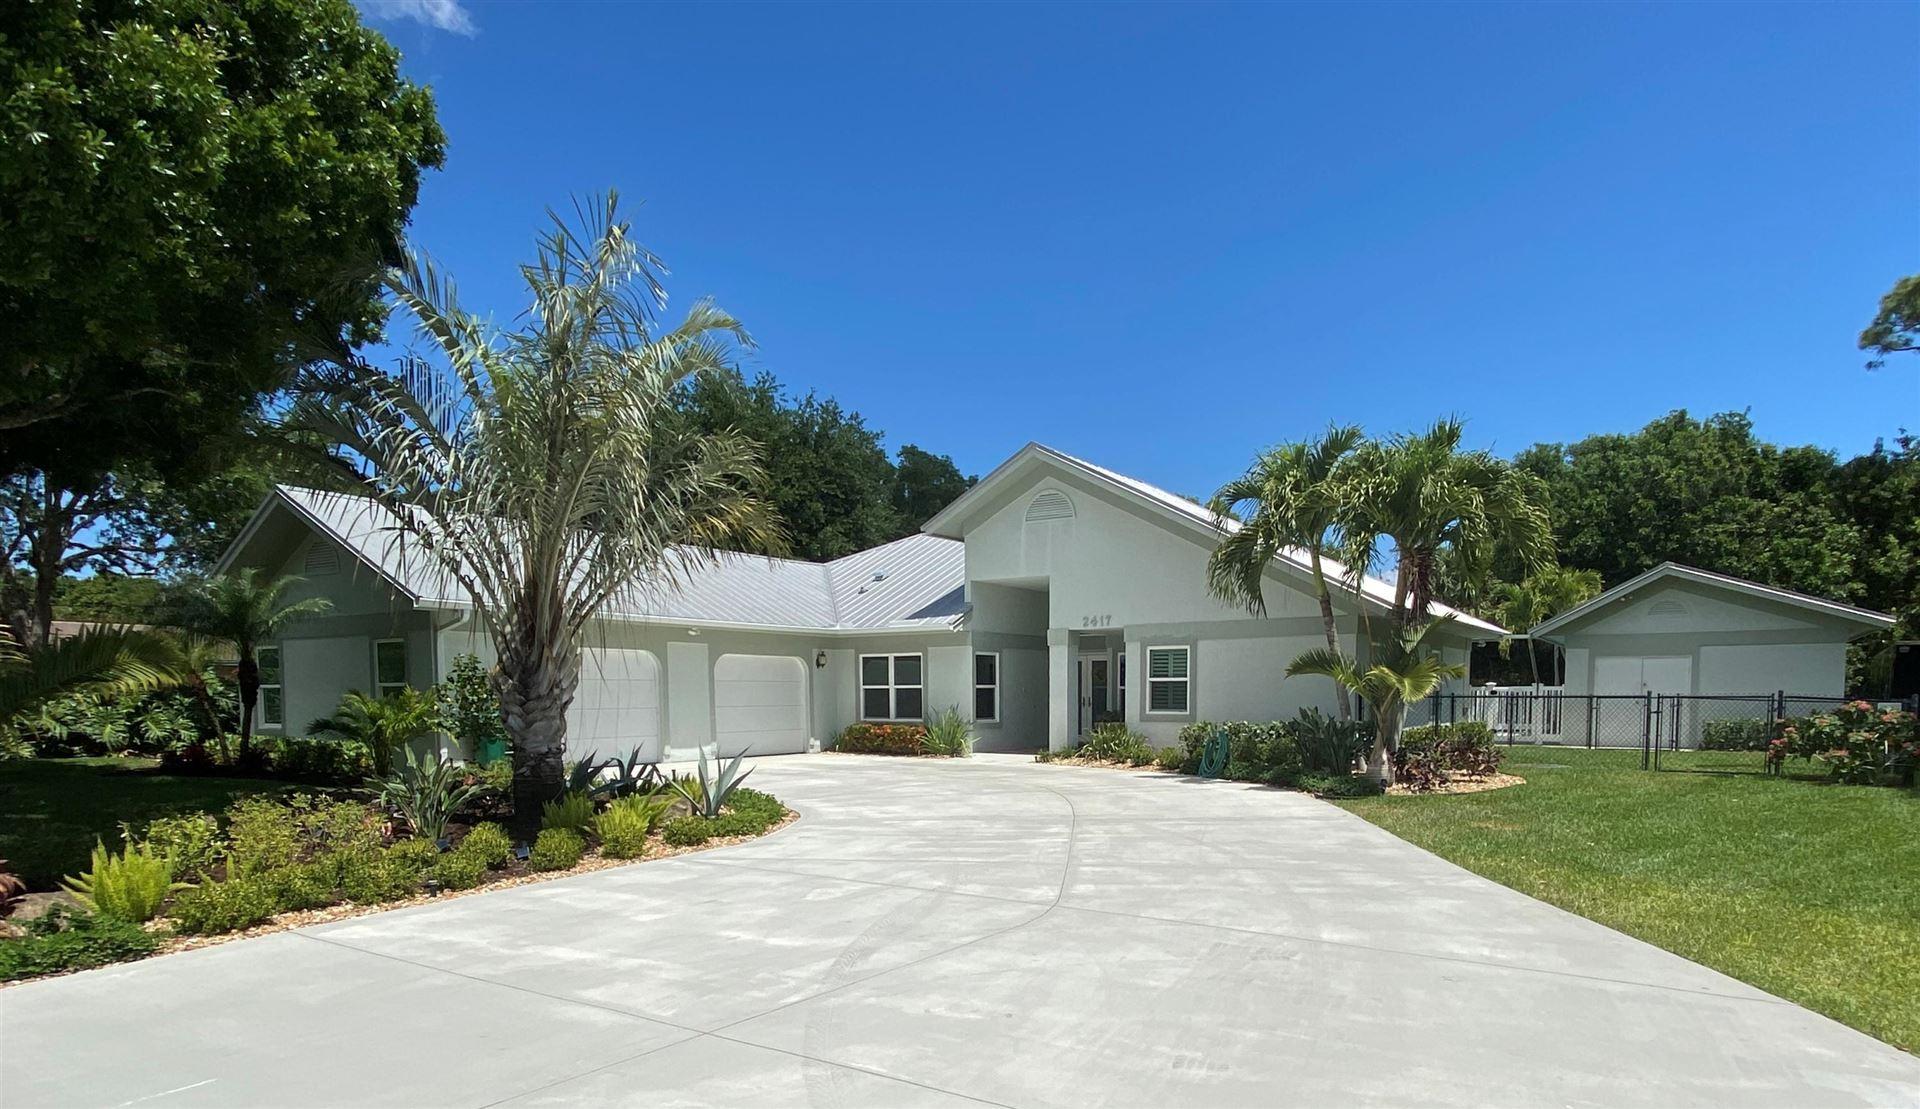 2417 SE Delano Road, Port Saint Lucie, FL 34952 - #: RX-10705770